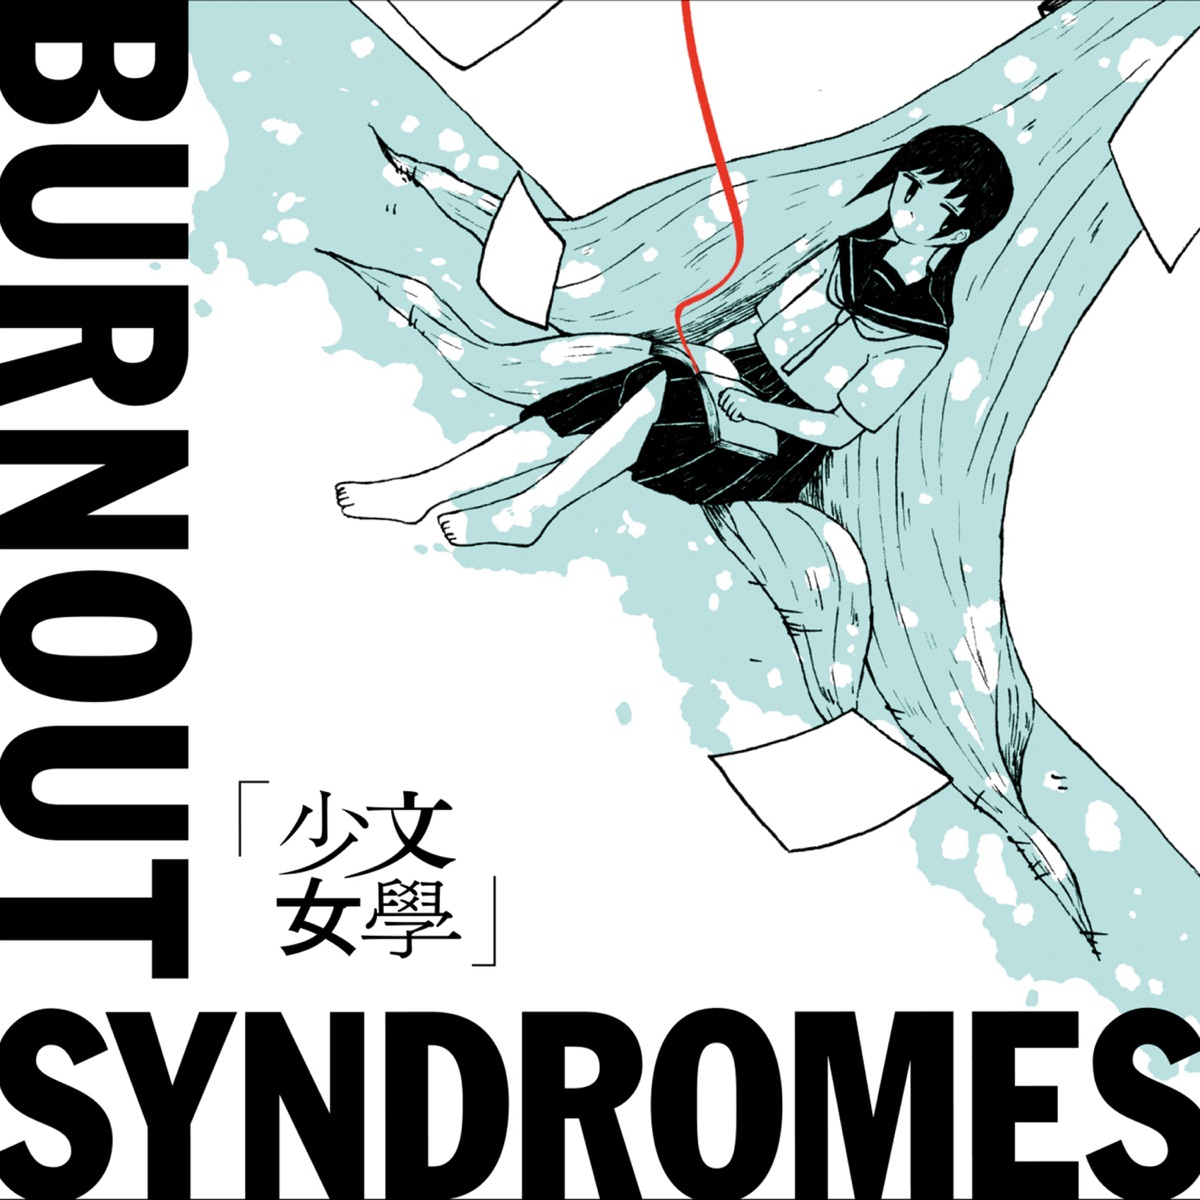 『BURNOUT SYNDROMES - セツナヒコウキ』収録の『文學少女』ジャケット